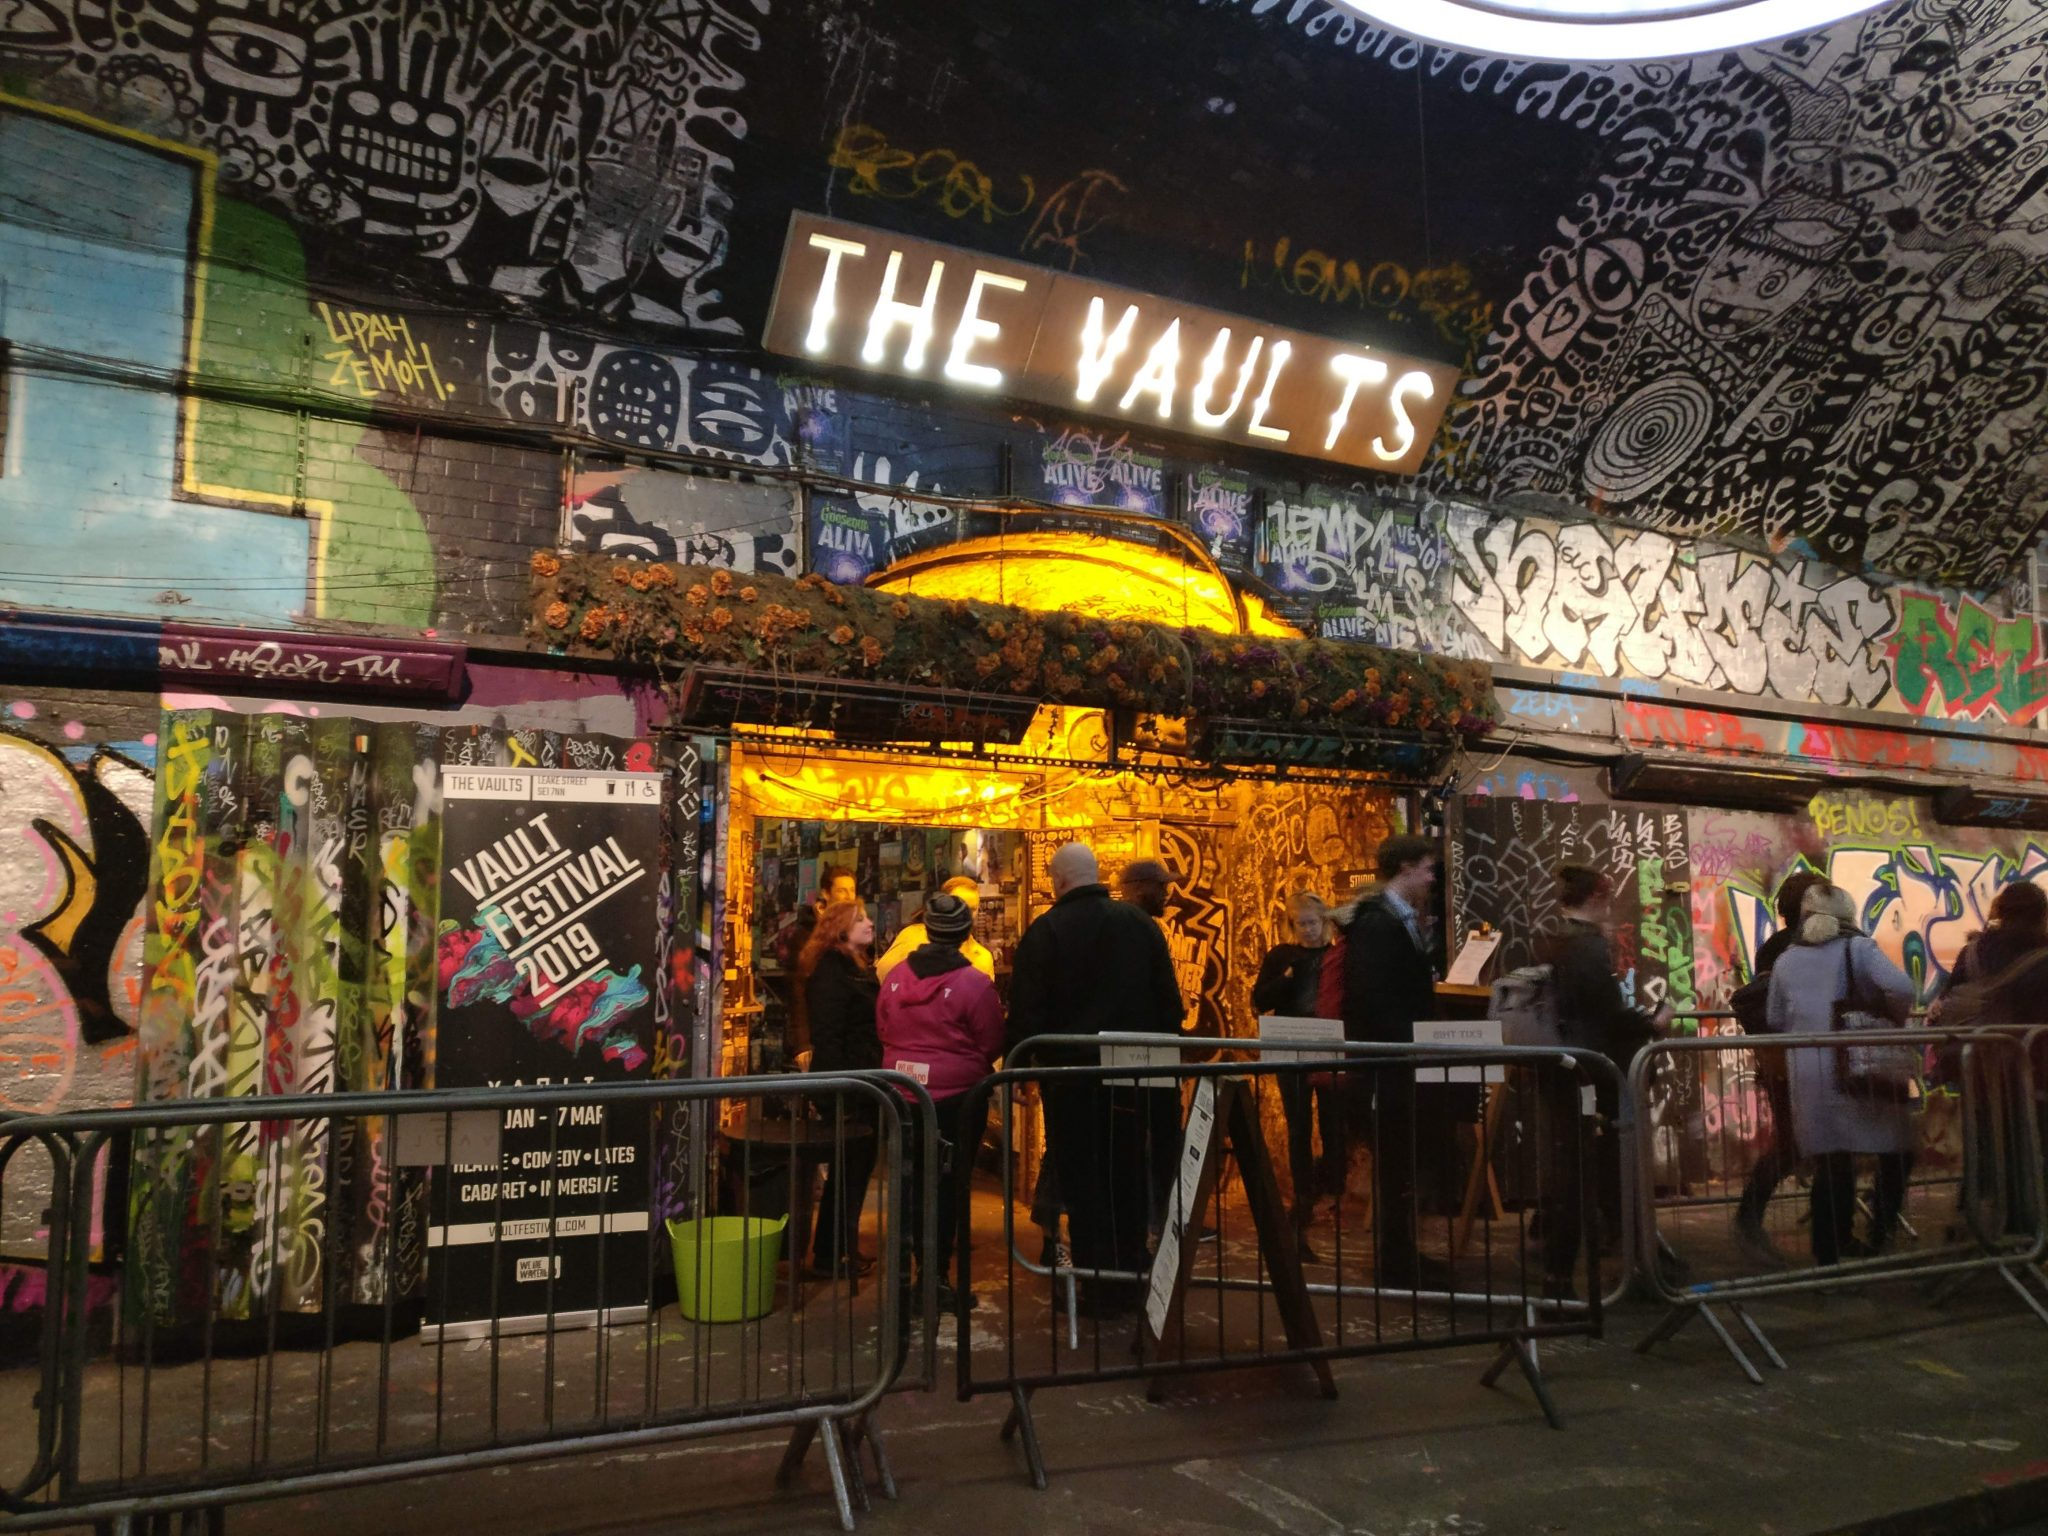 The Vaults entrance